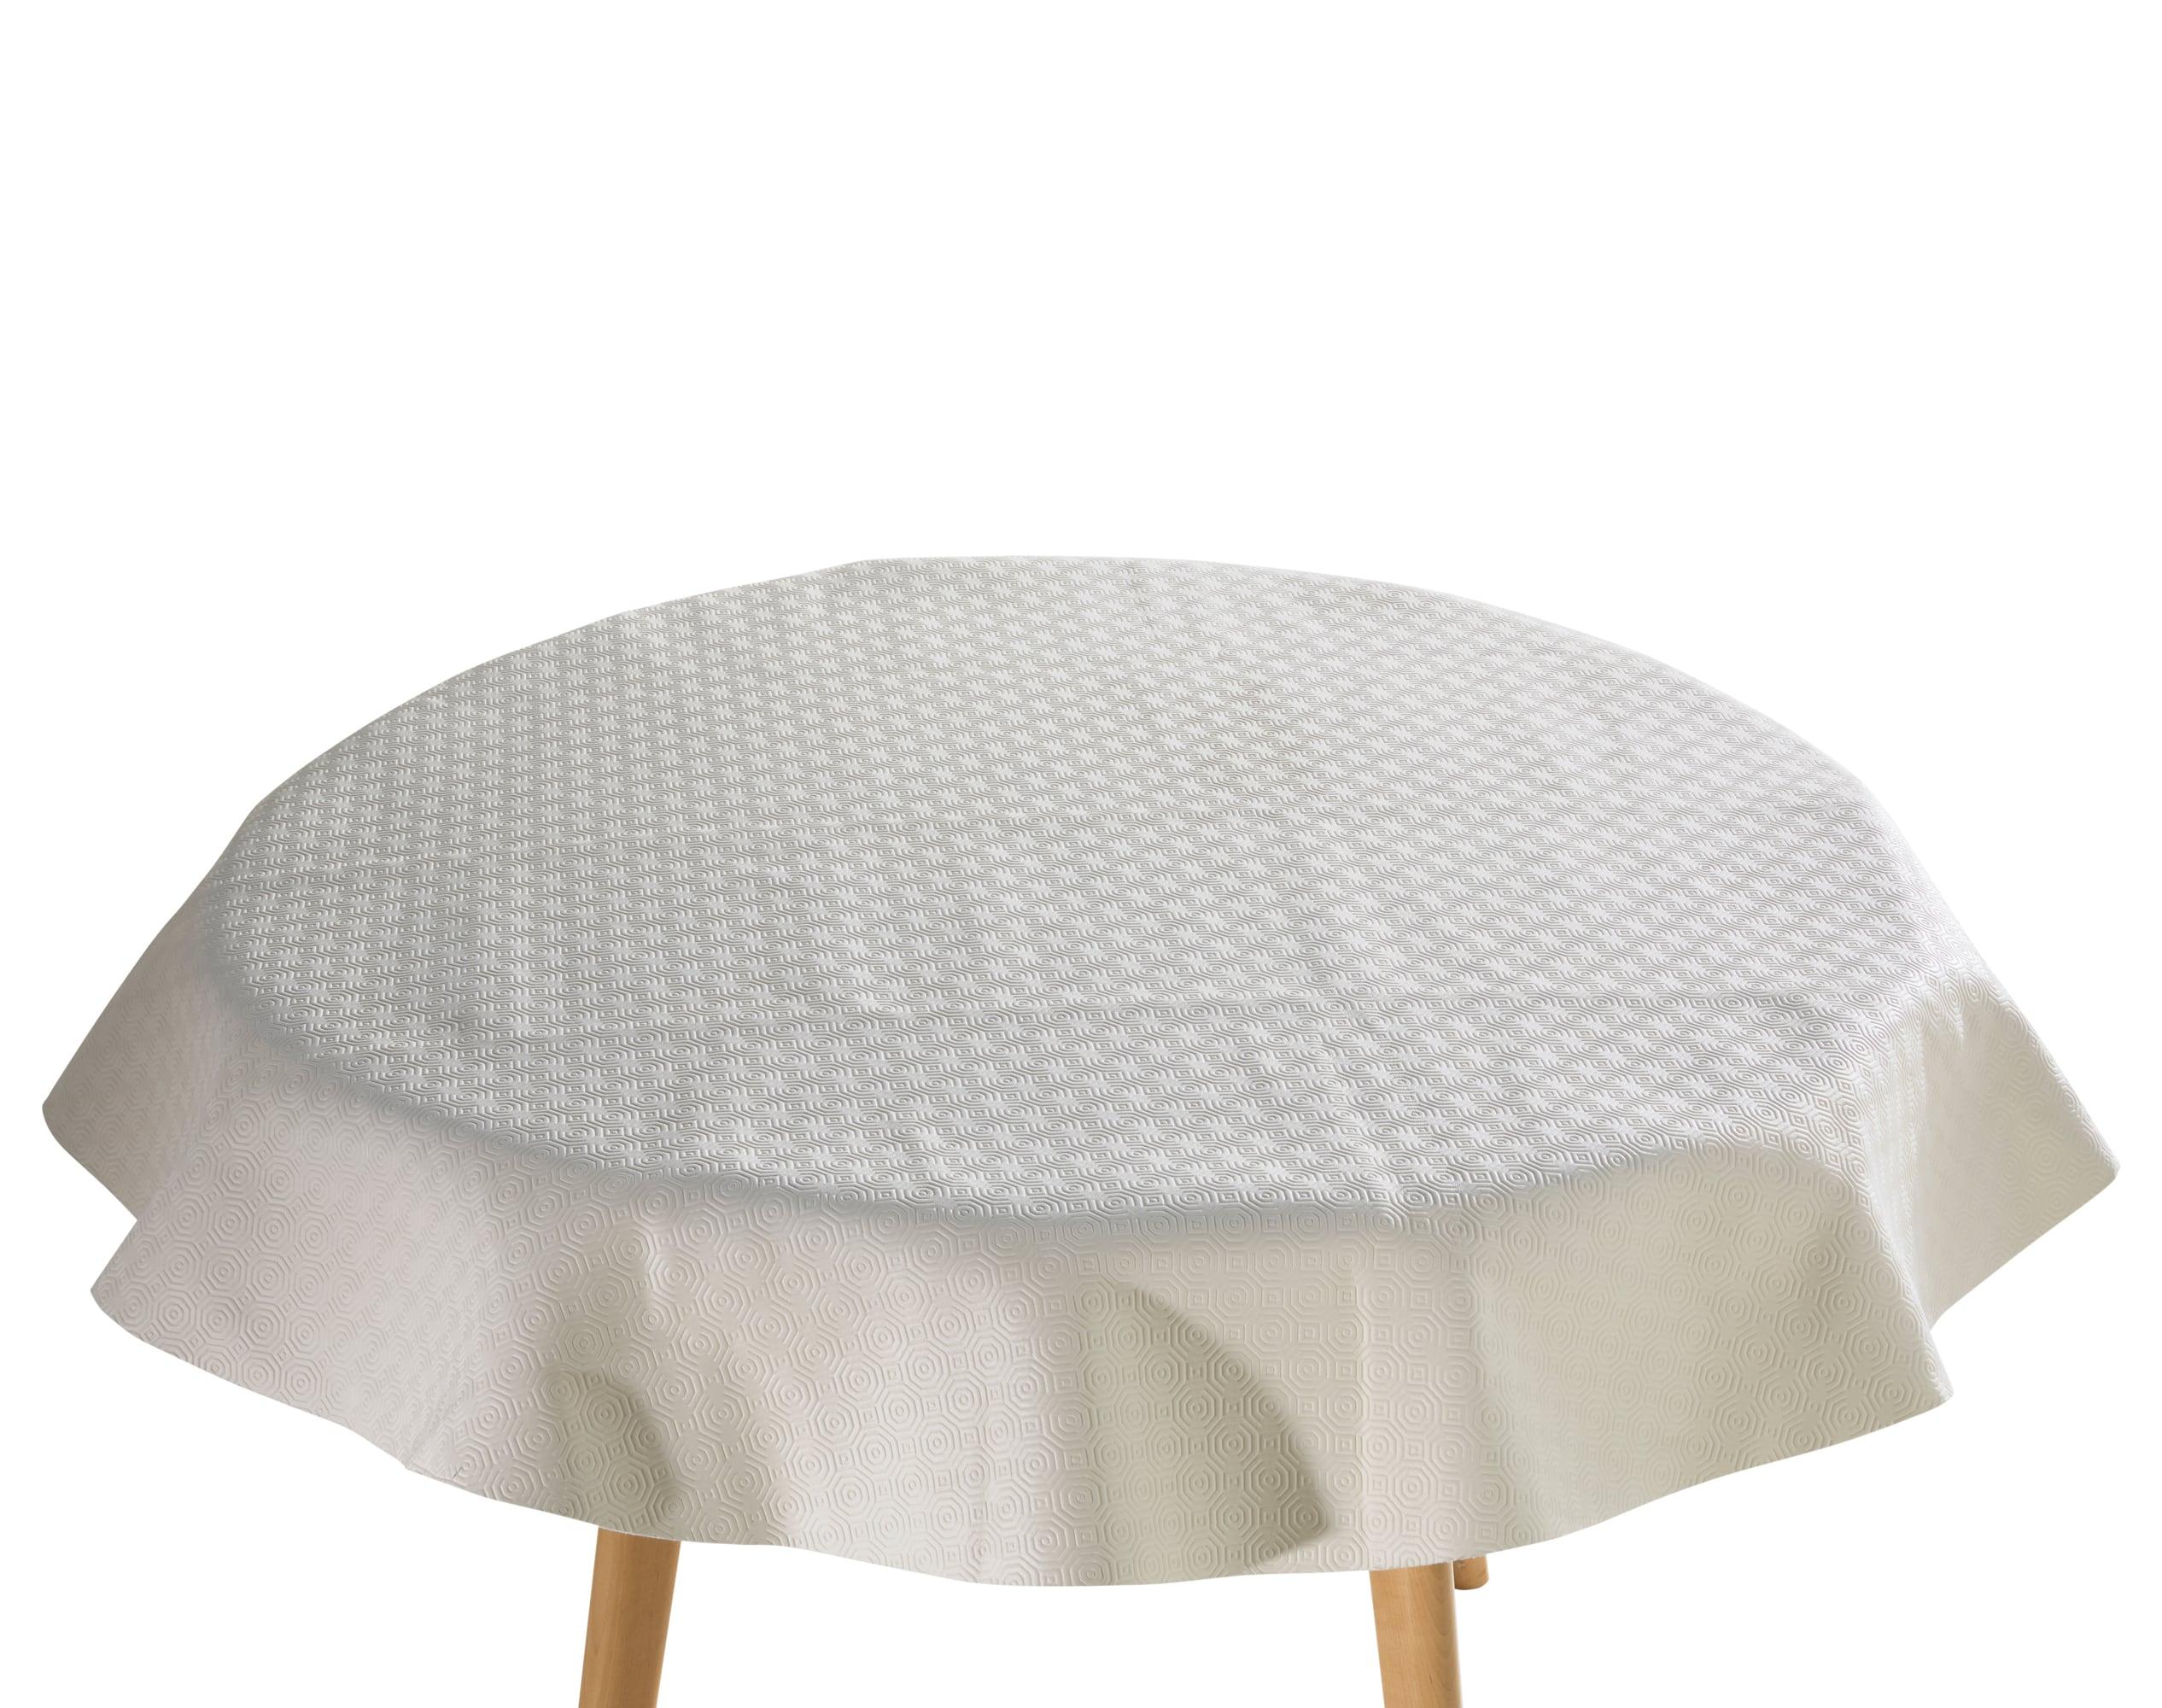 Protège-table standard ovale blanc 135x180